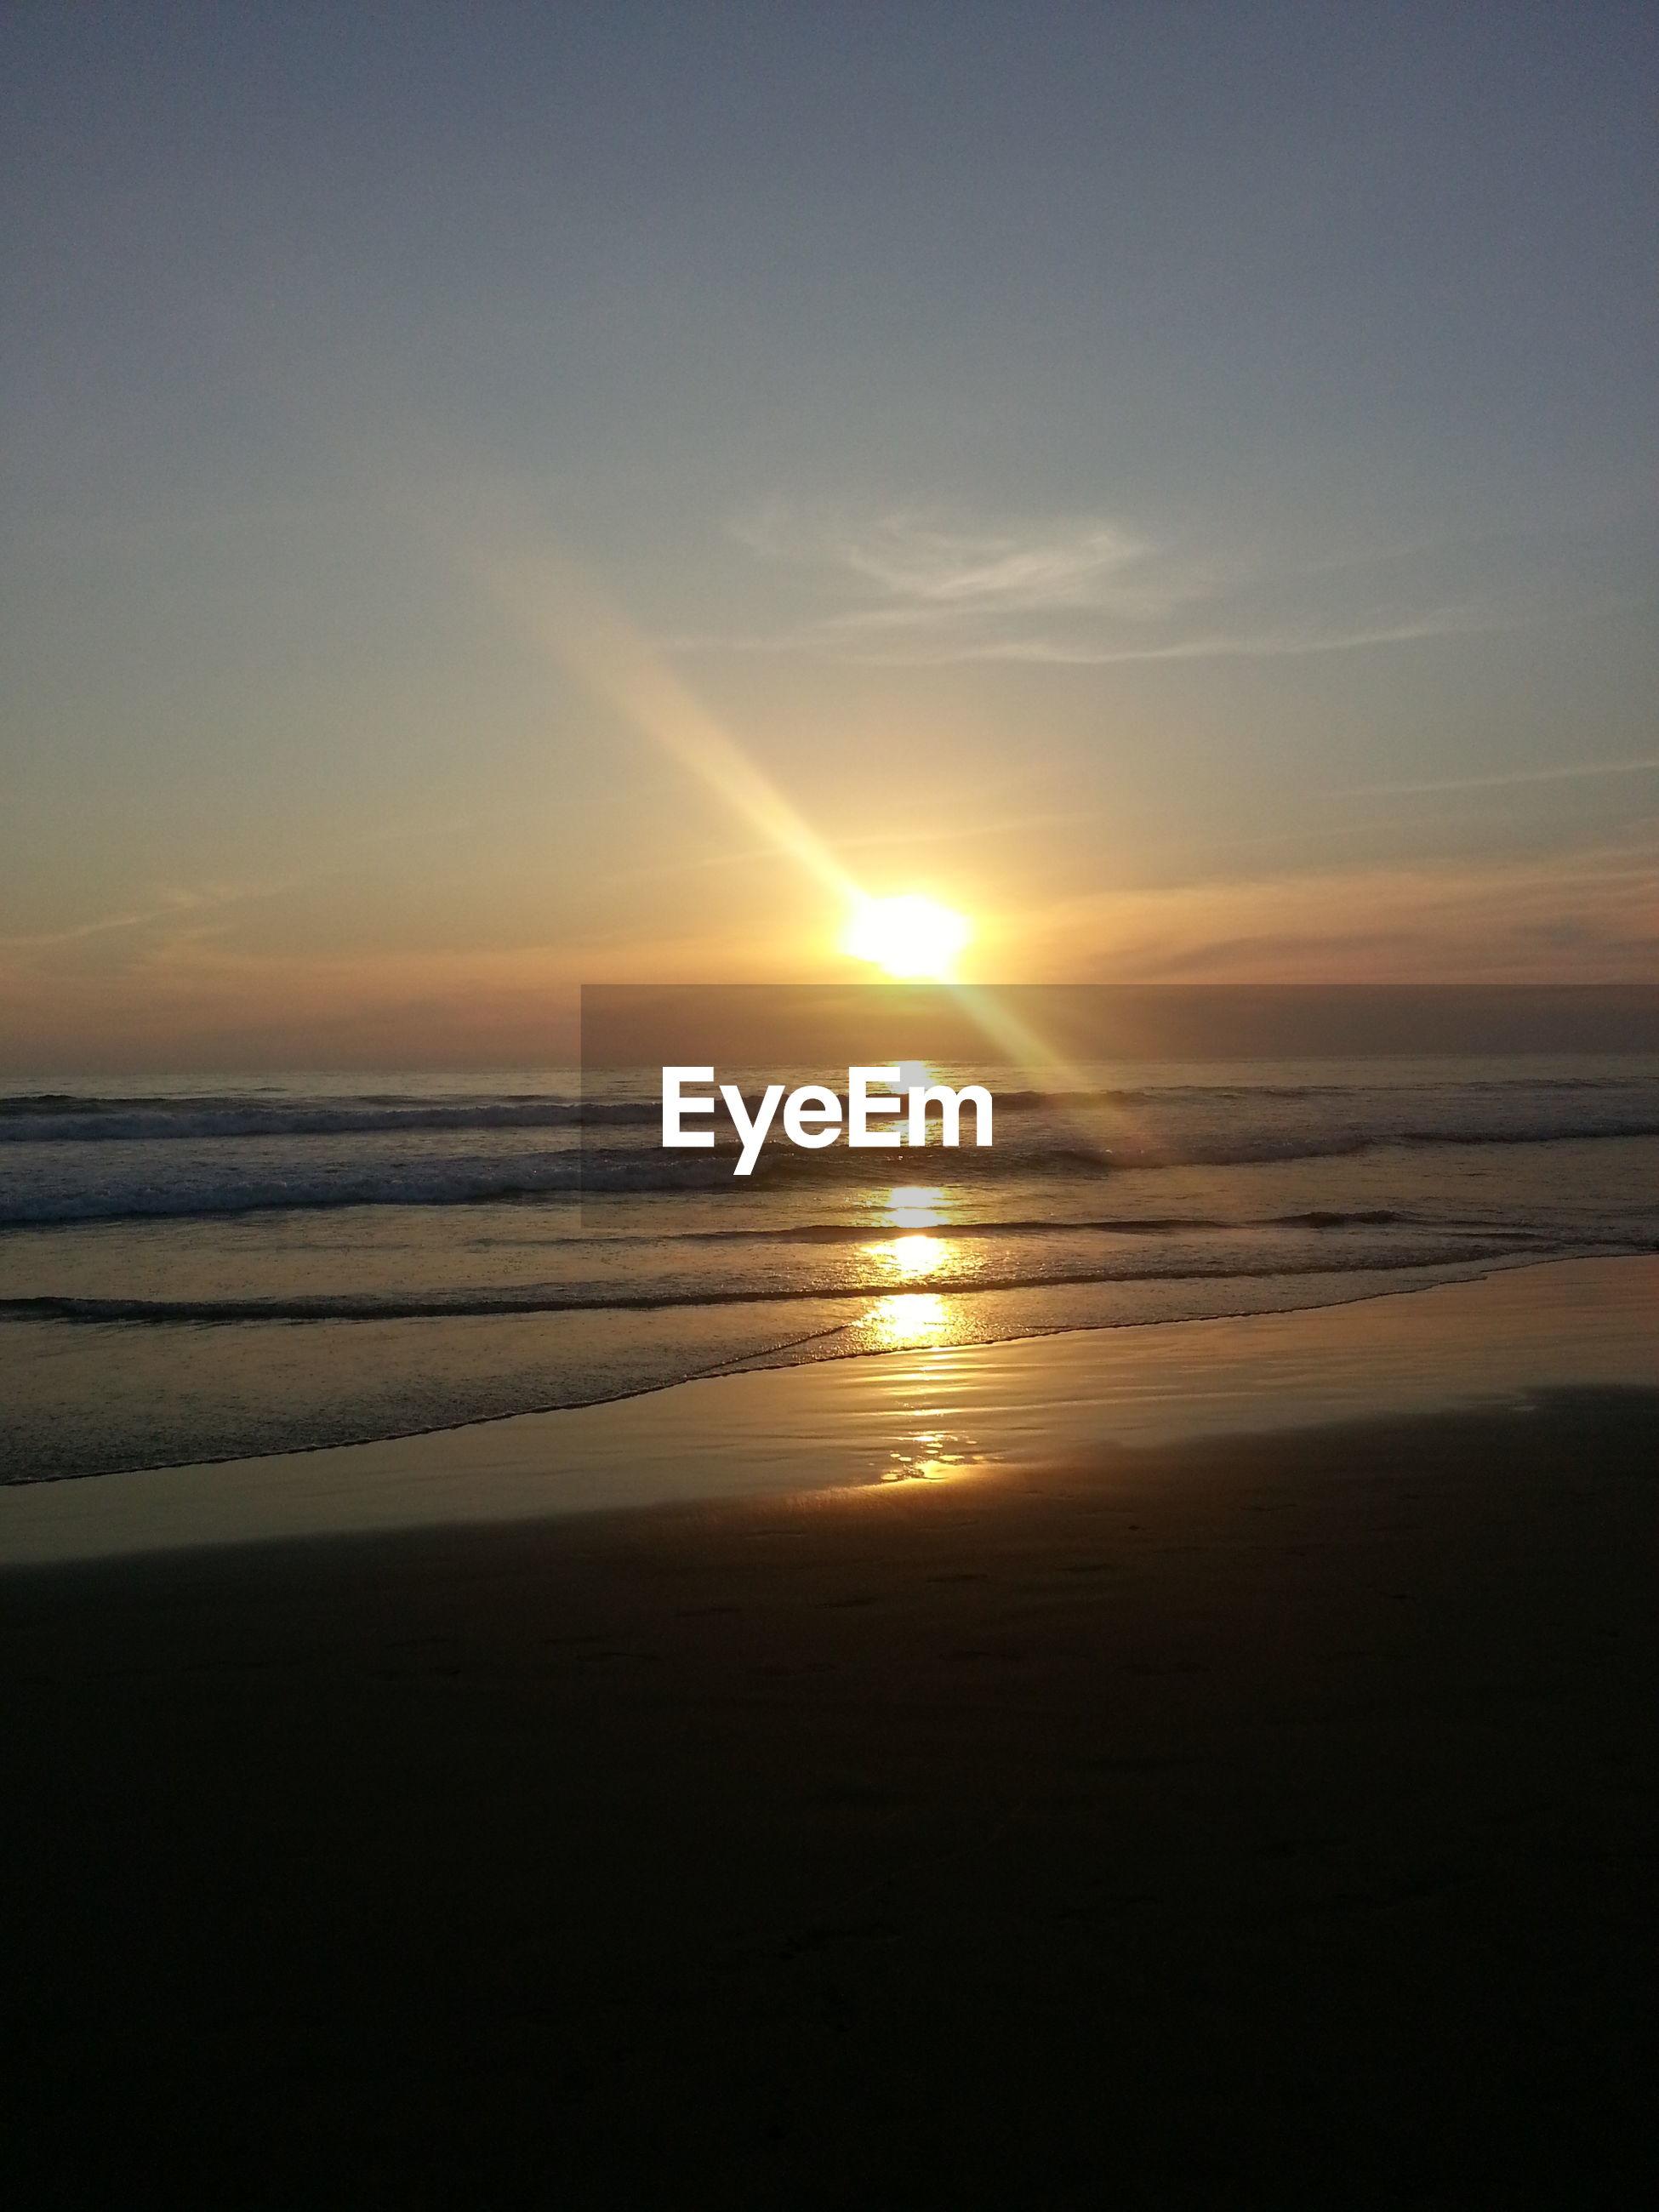 sea, horizon over water, sunset, scenics, tranquil scene, sun, tranquility, beauty in nature, water, beach, sky, nature, idyllic, shore, silhouette, sunlight, reflection, sunbeam, calm, remote